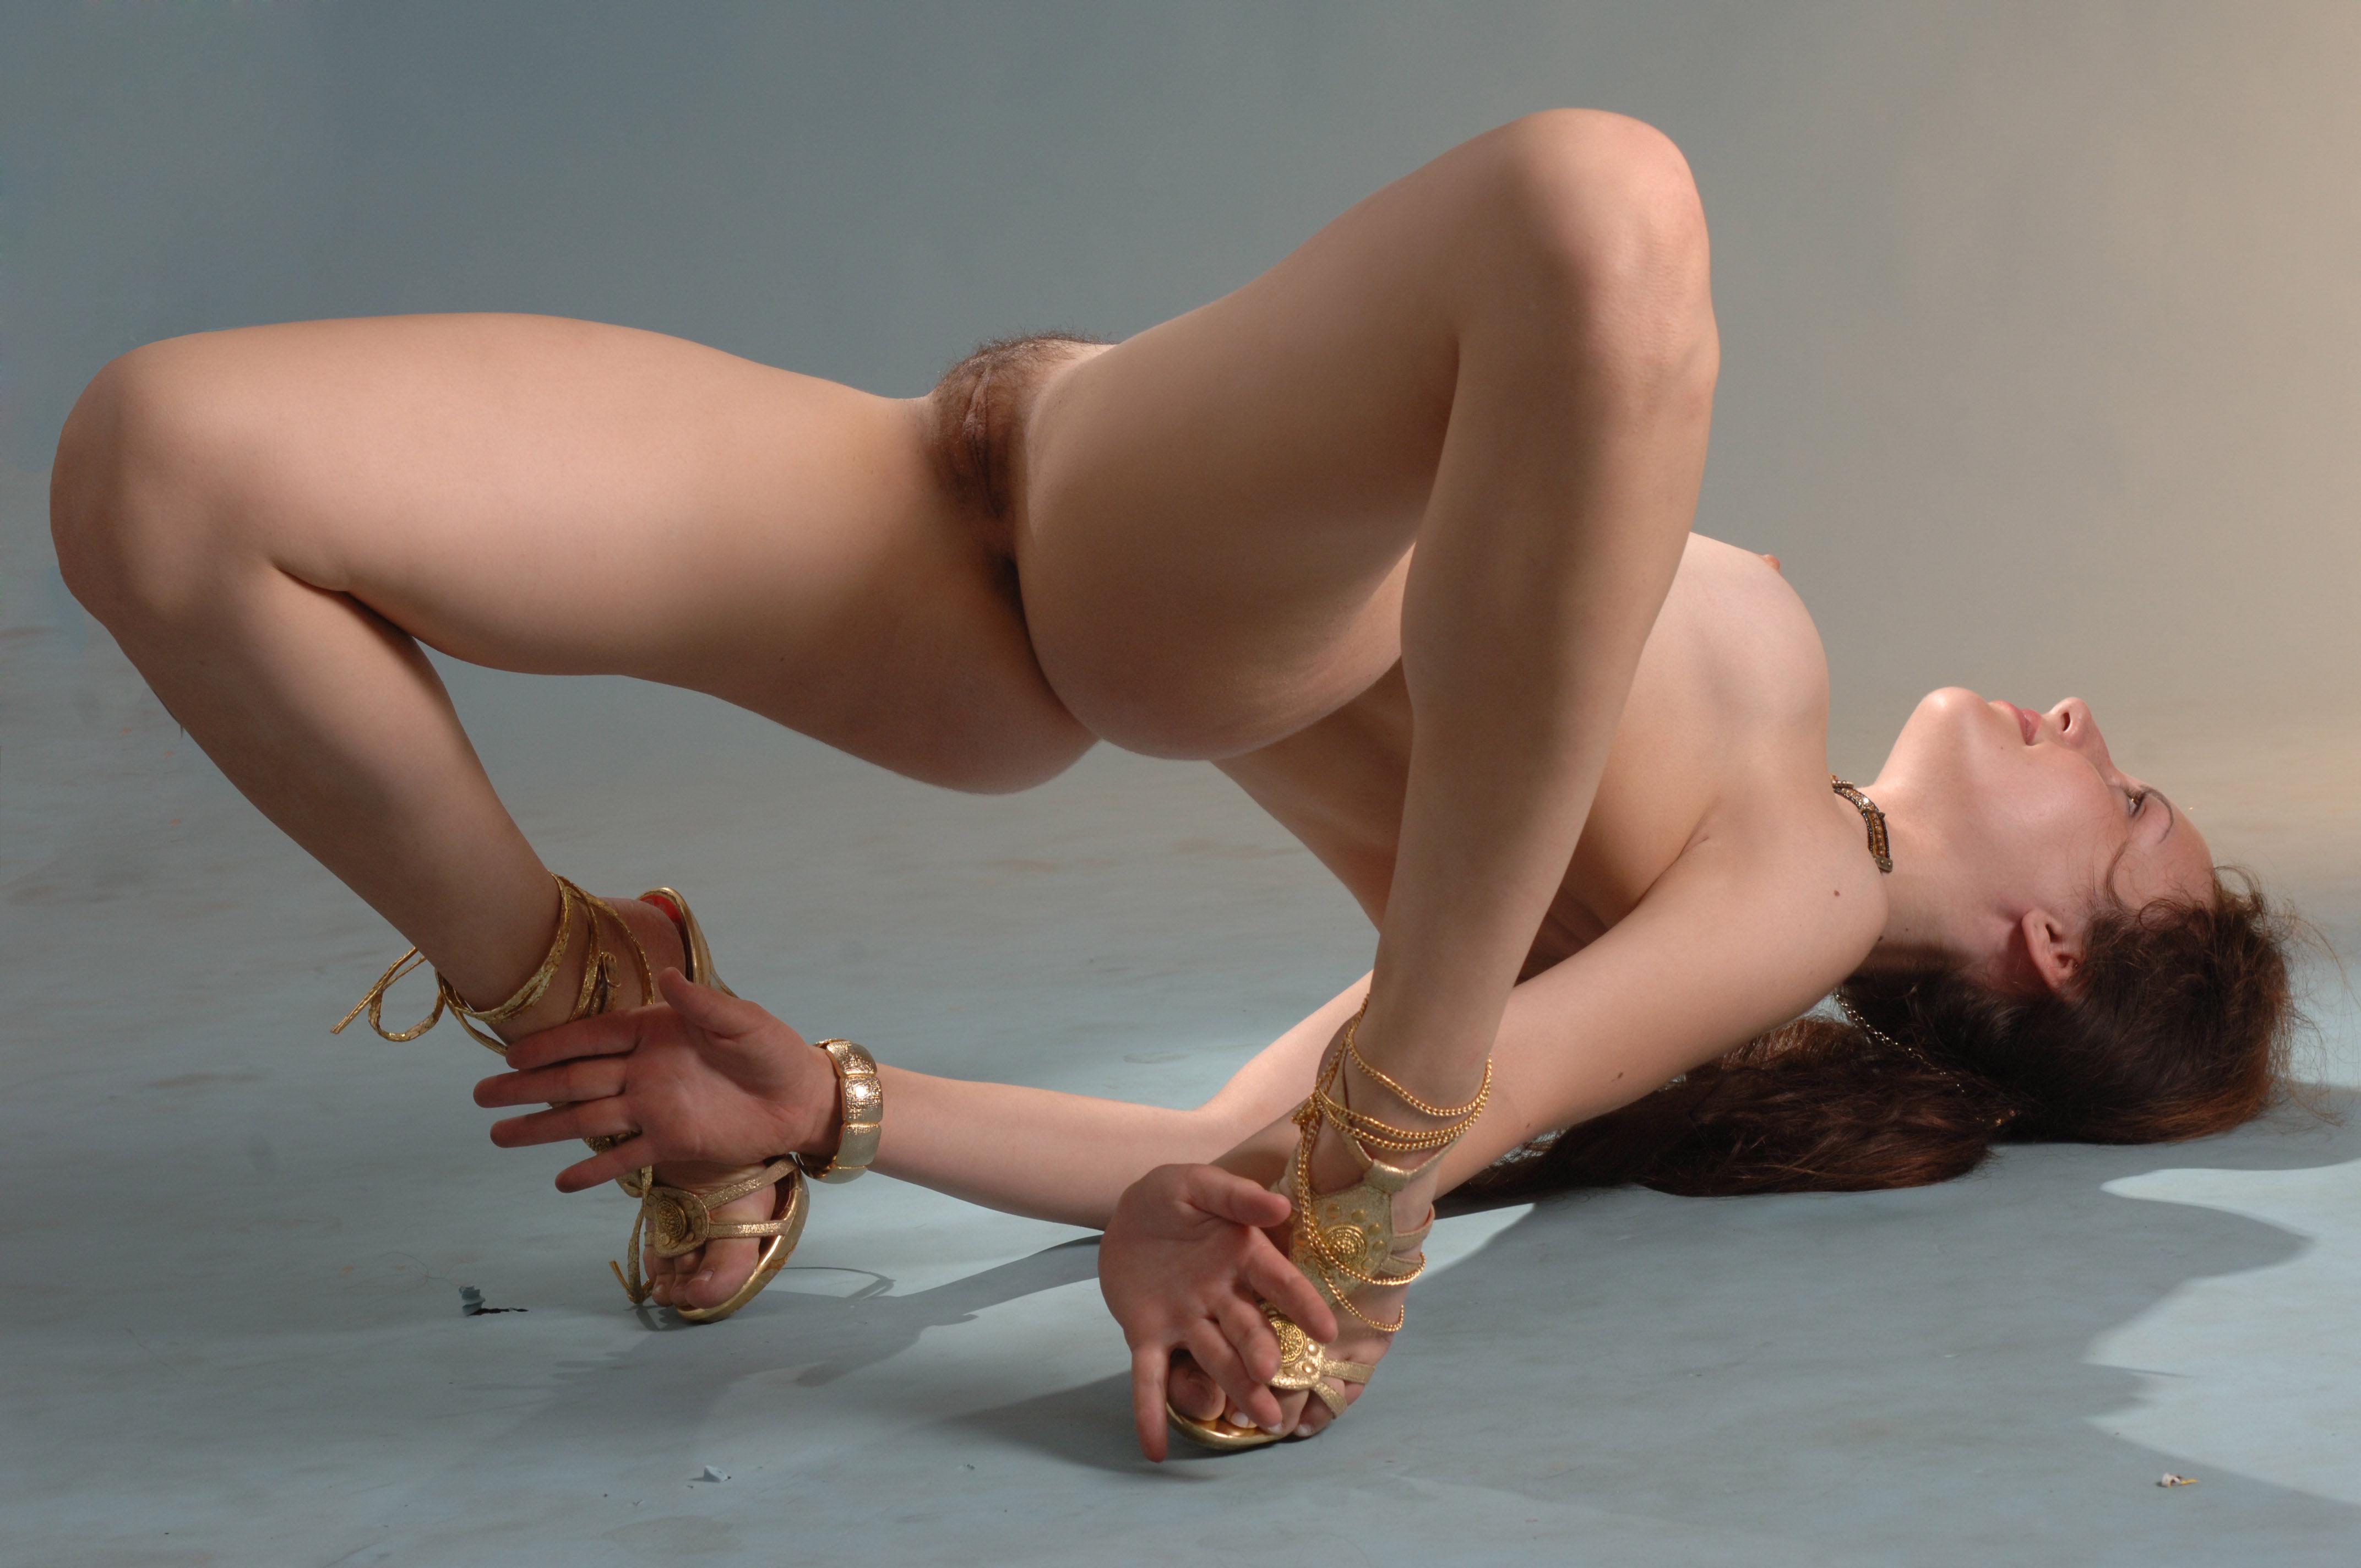 Порно-интим фото гимнасток девушек 6